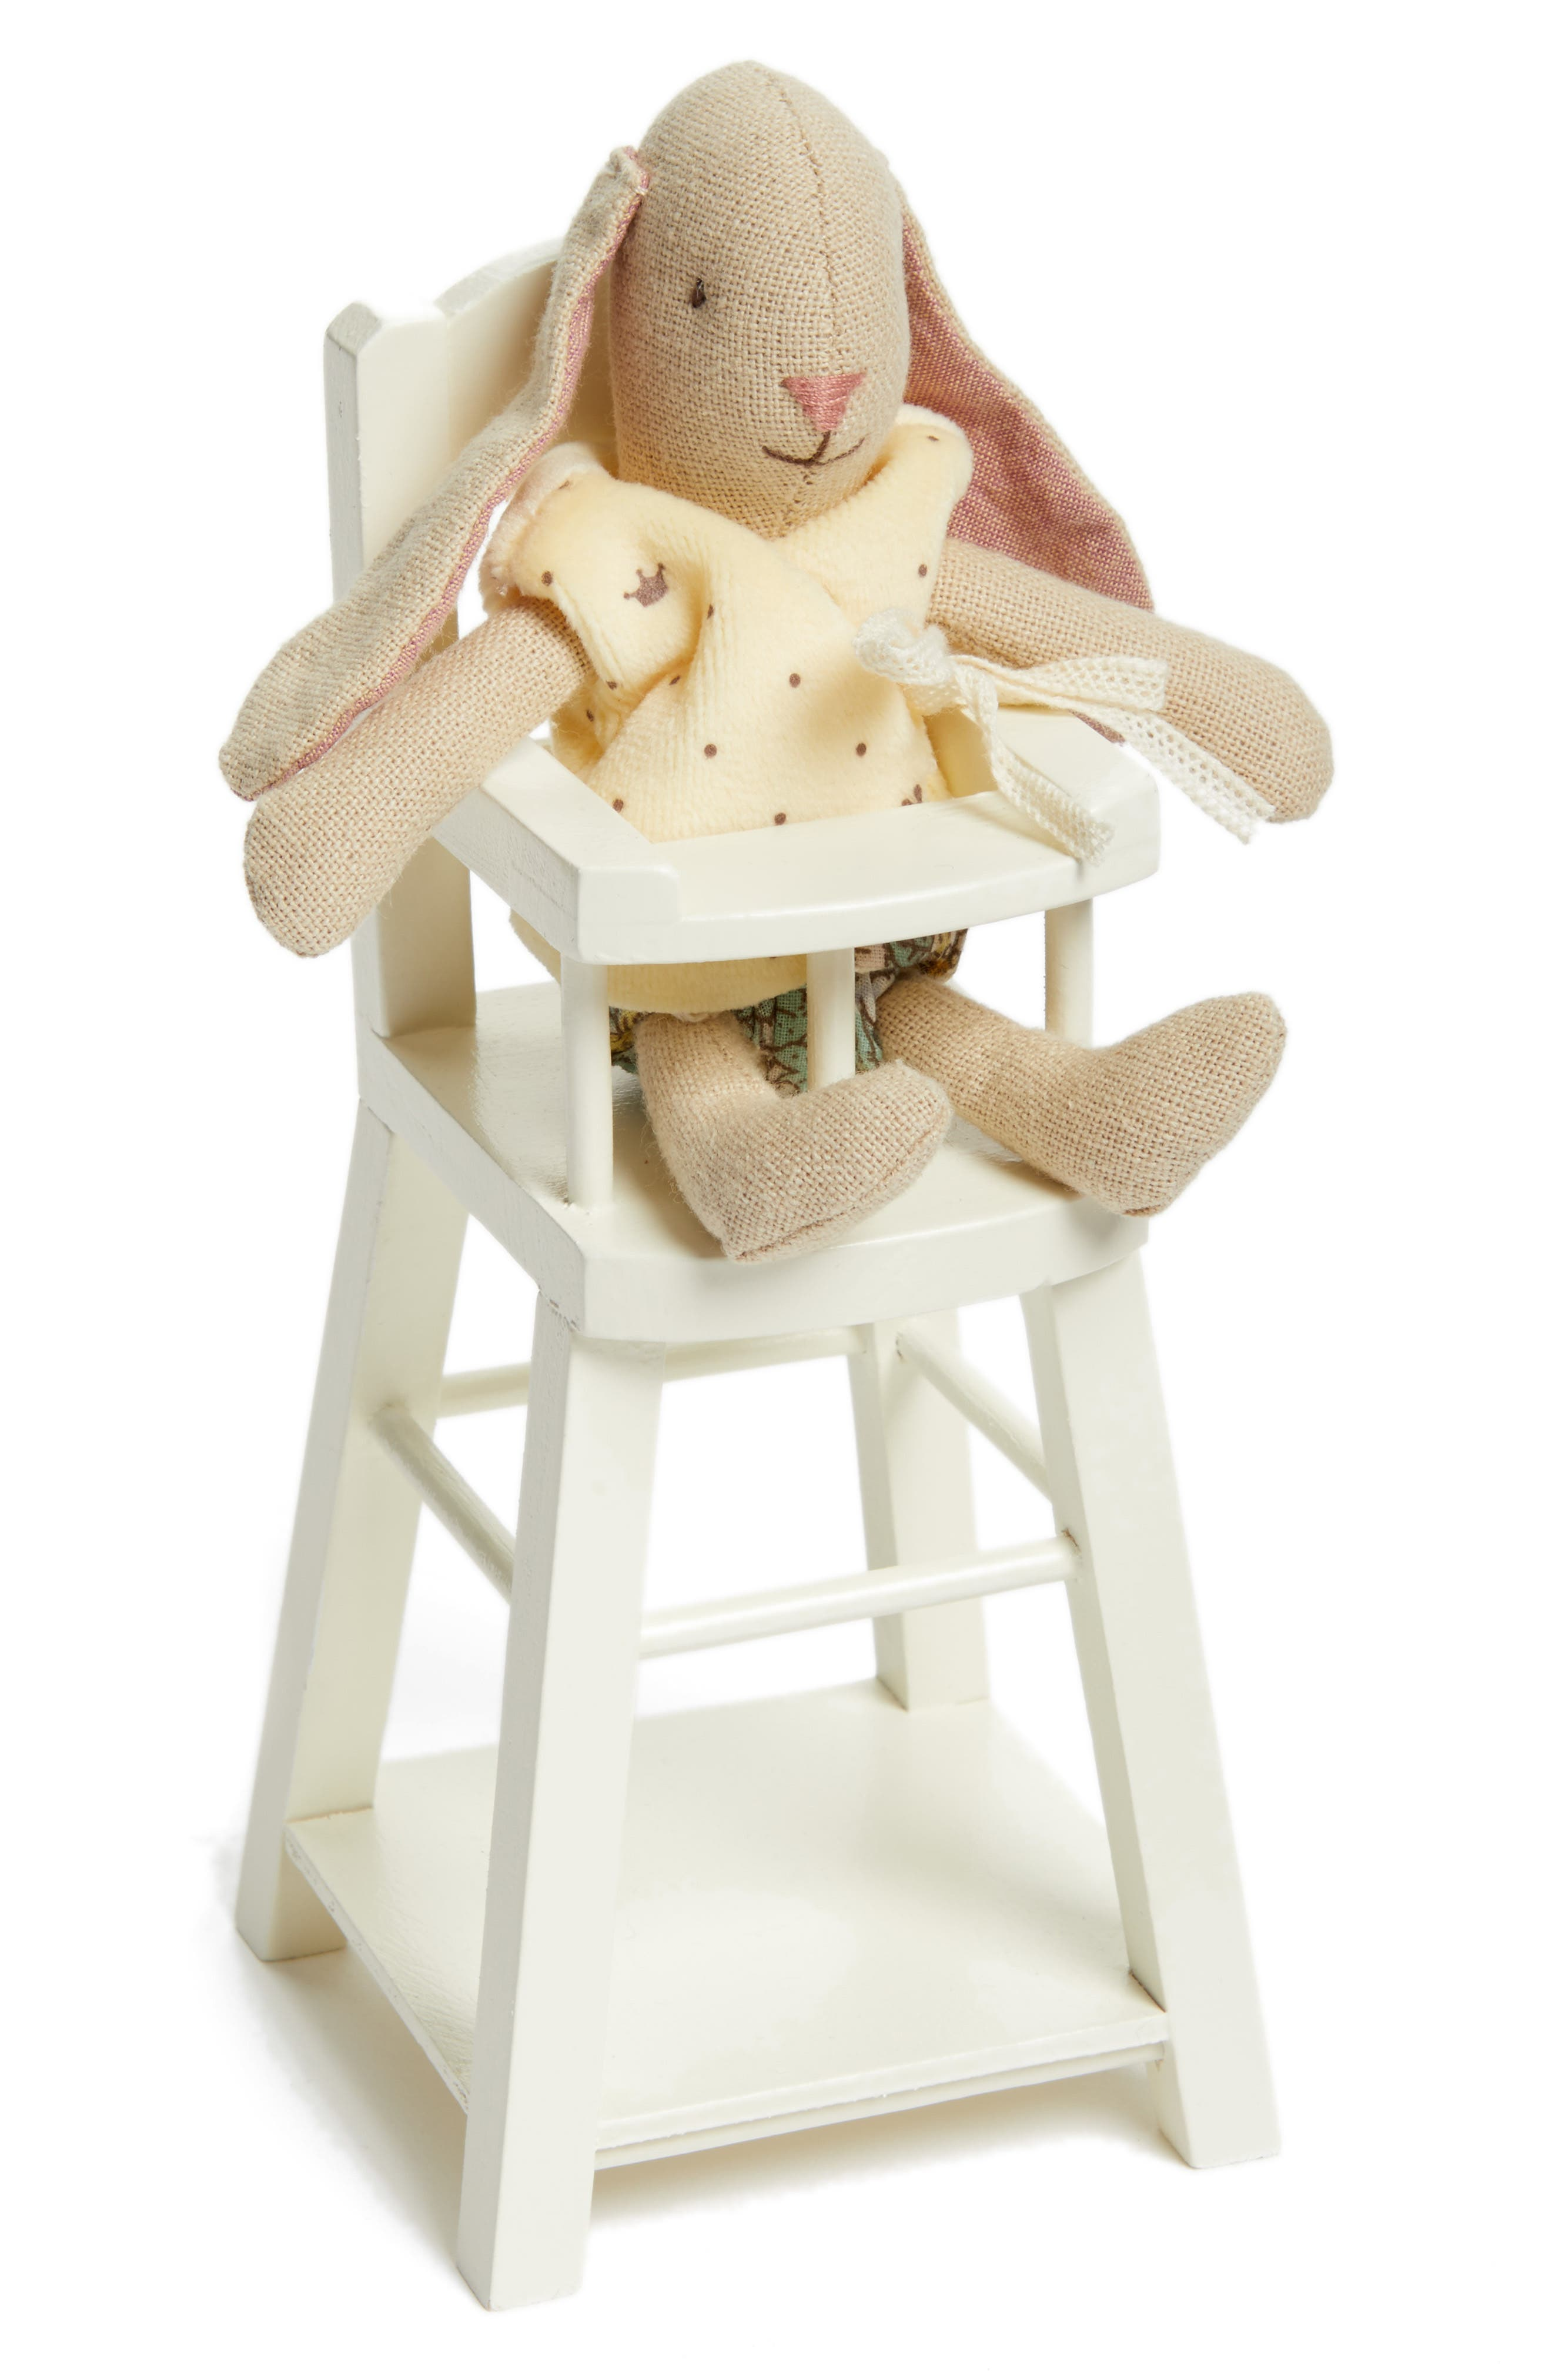 Maileg Micro Bunny Rabbit Stuffed Animal and Highchair